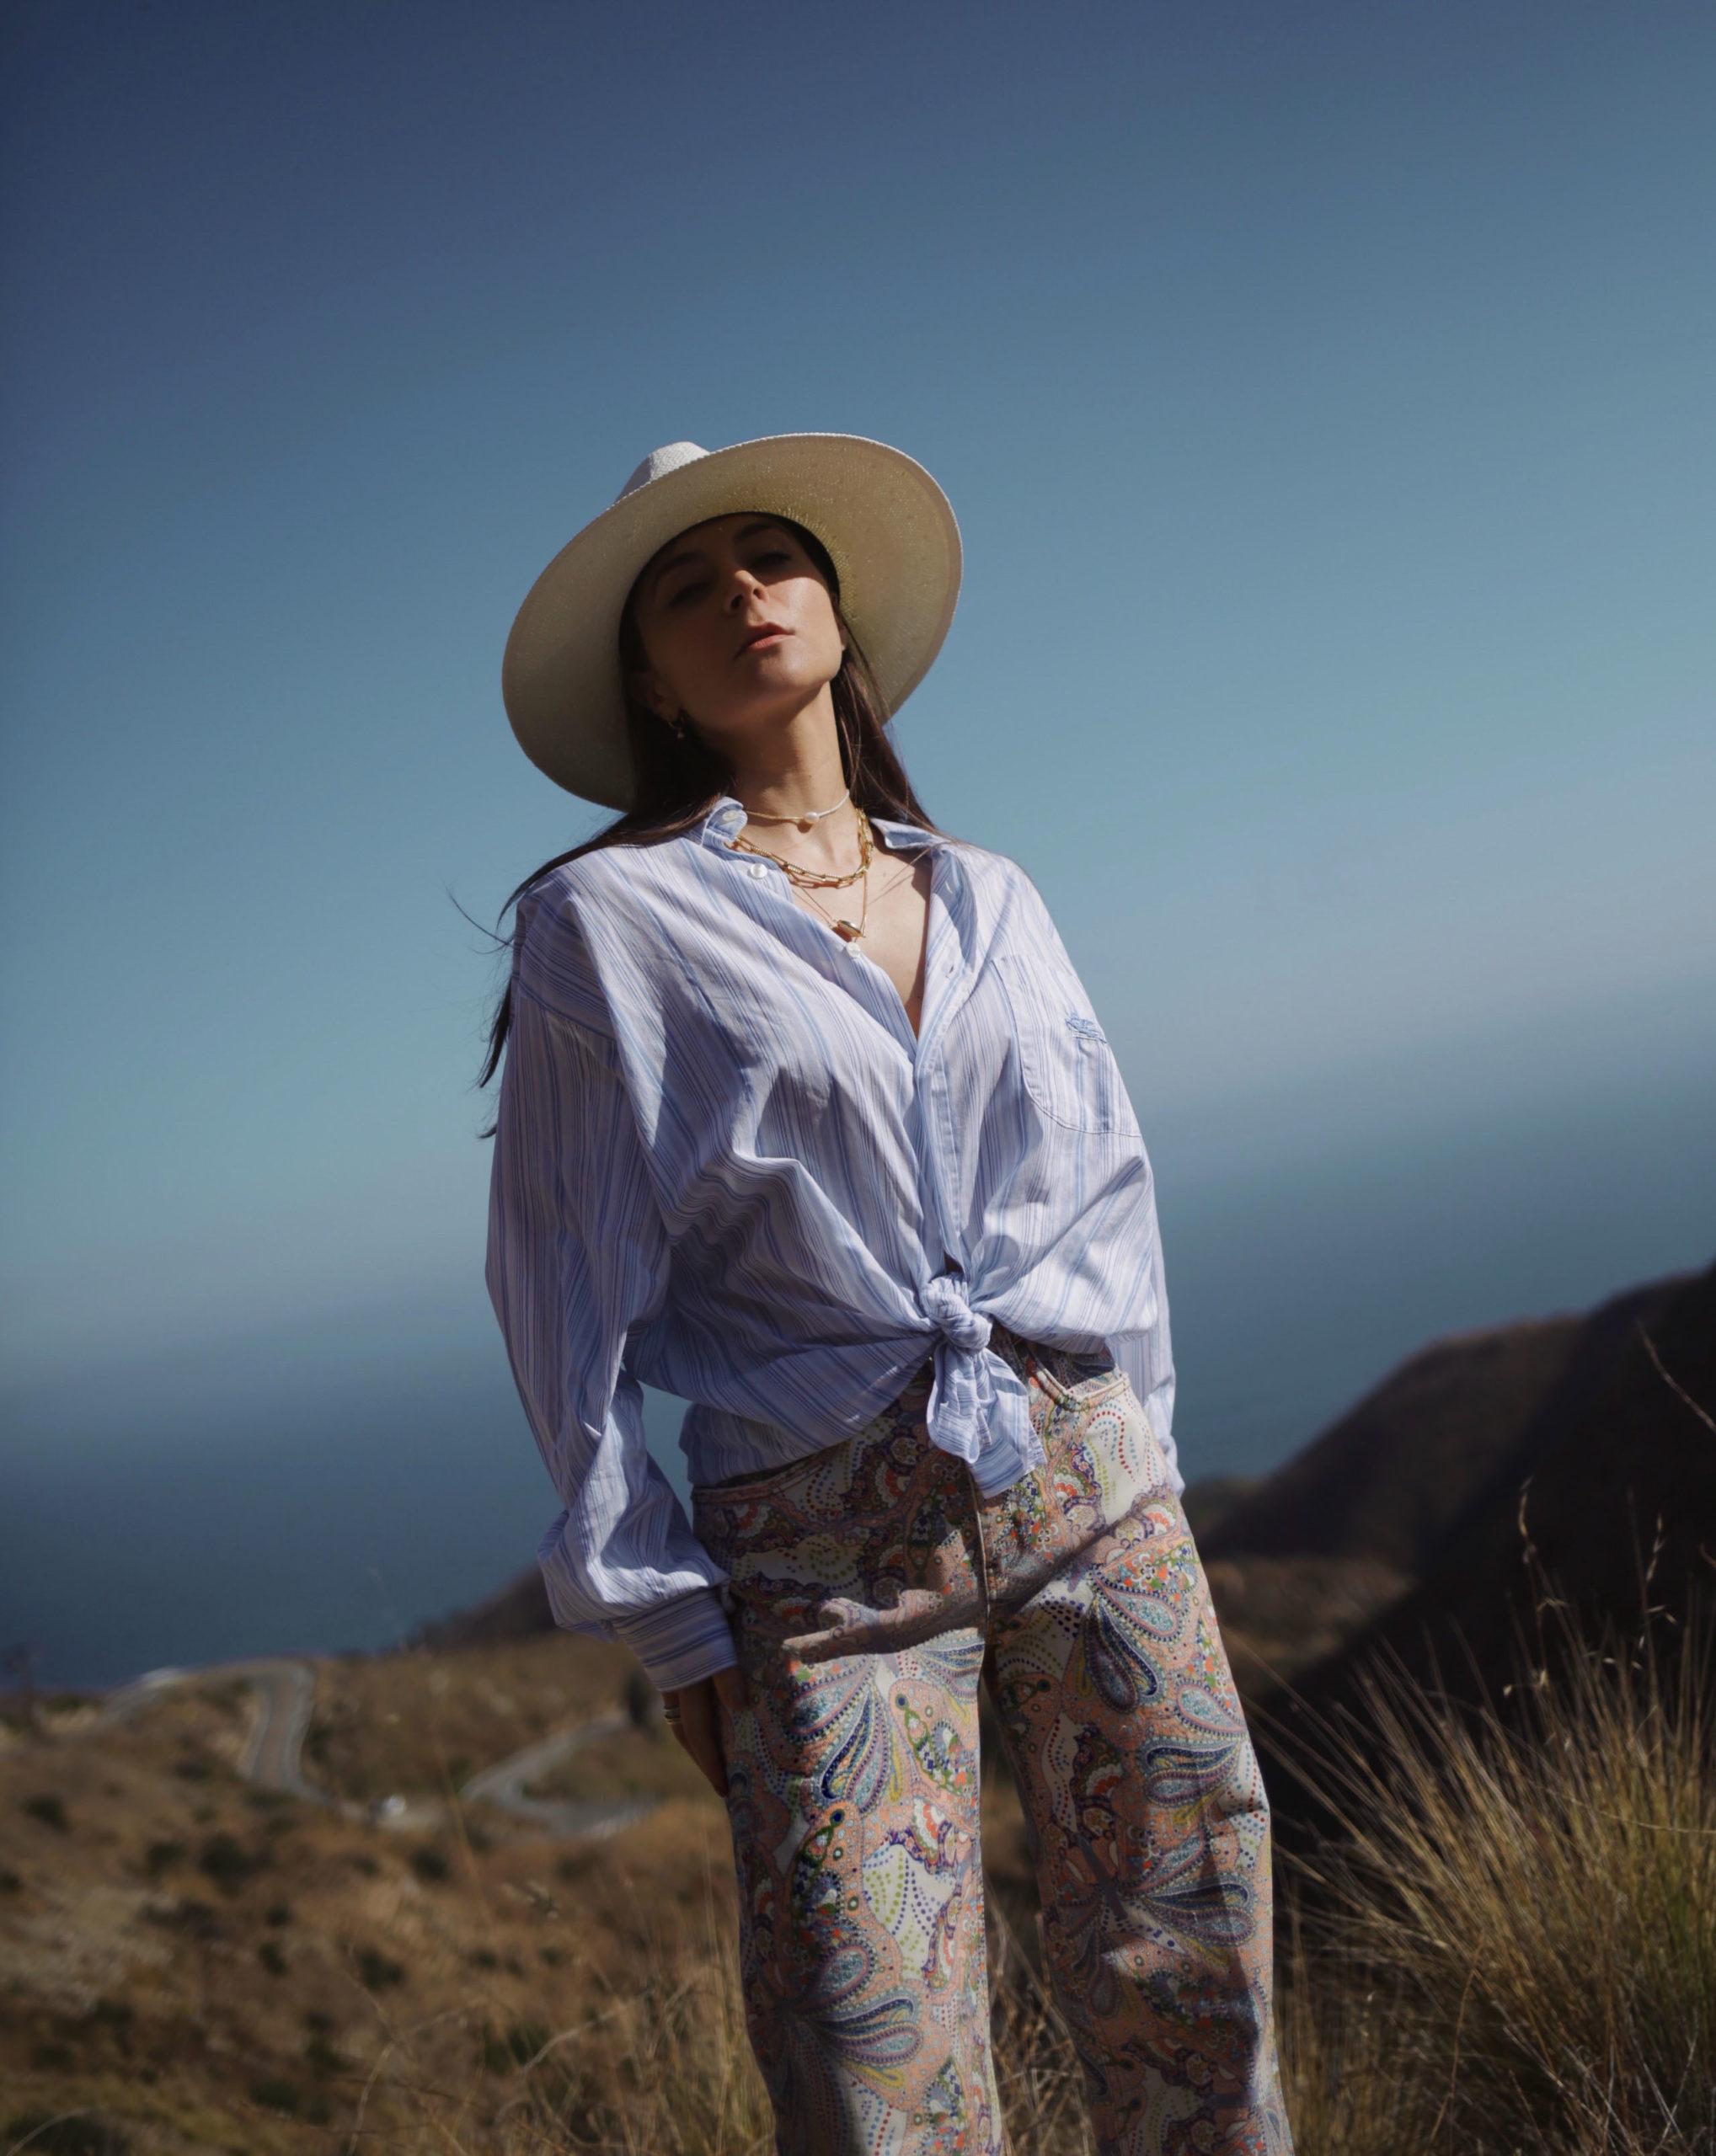 Summer style in Malibu etro fashion editorial 2020 - etro 70s denim boho chic outfit style summer style edgy chic cashmere denim pants